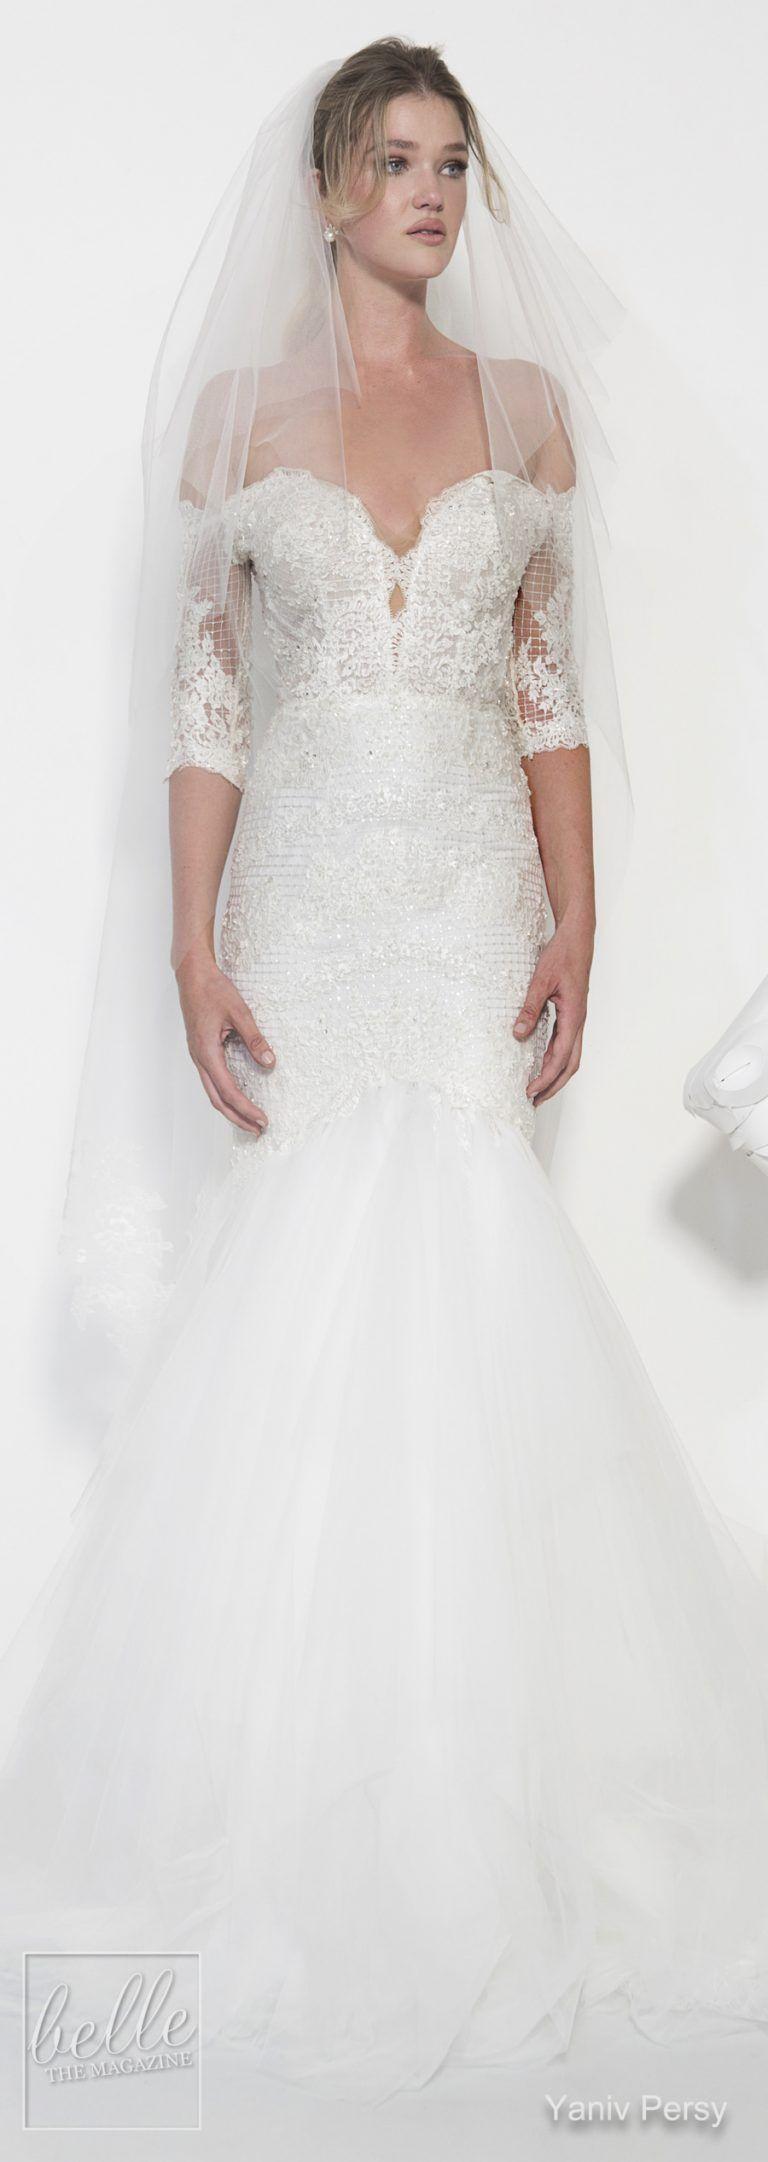 Yaniv persy wedding dresses spring bridal collection wedding